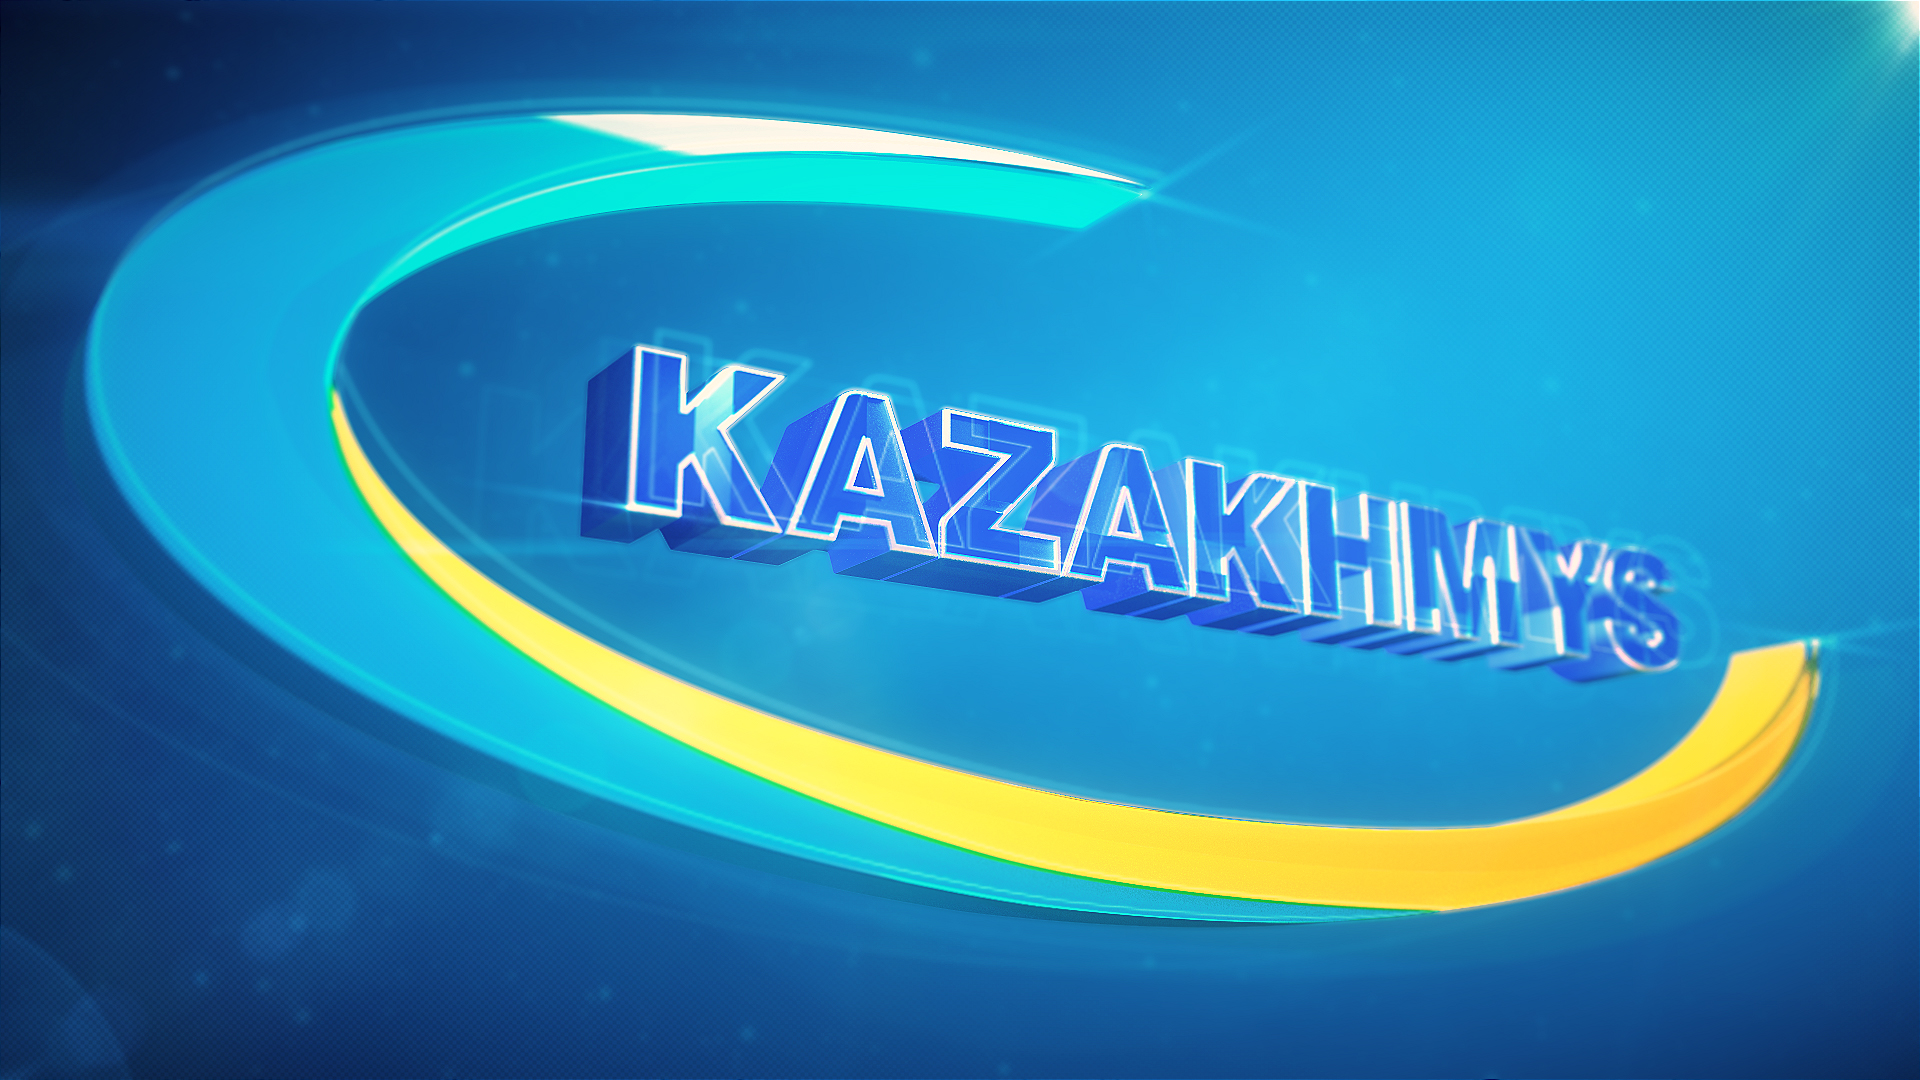 https://inbusiness.kz/ru/images/original/19/images/sc7J2oCO.jpg